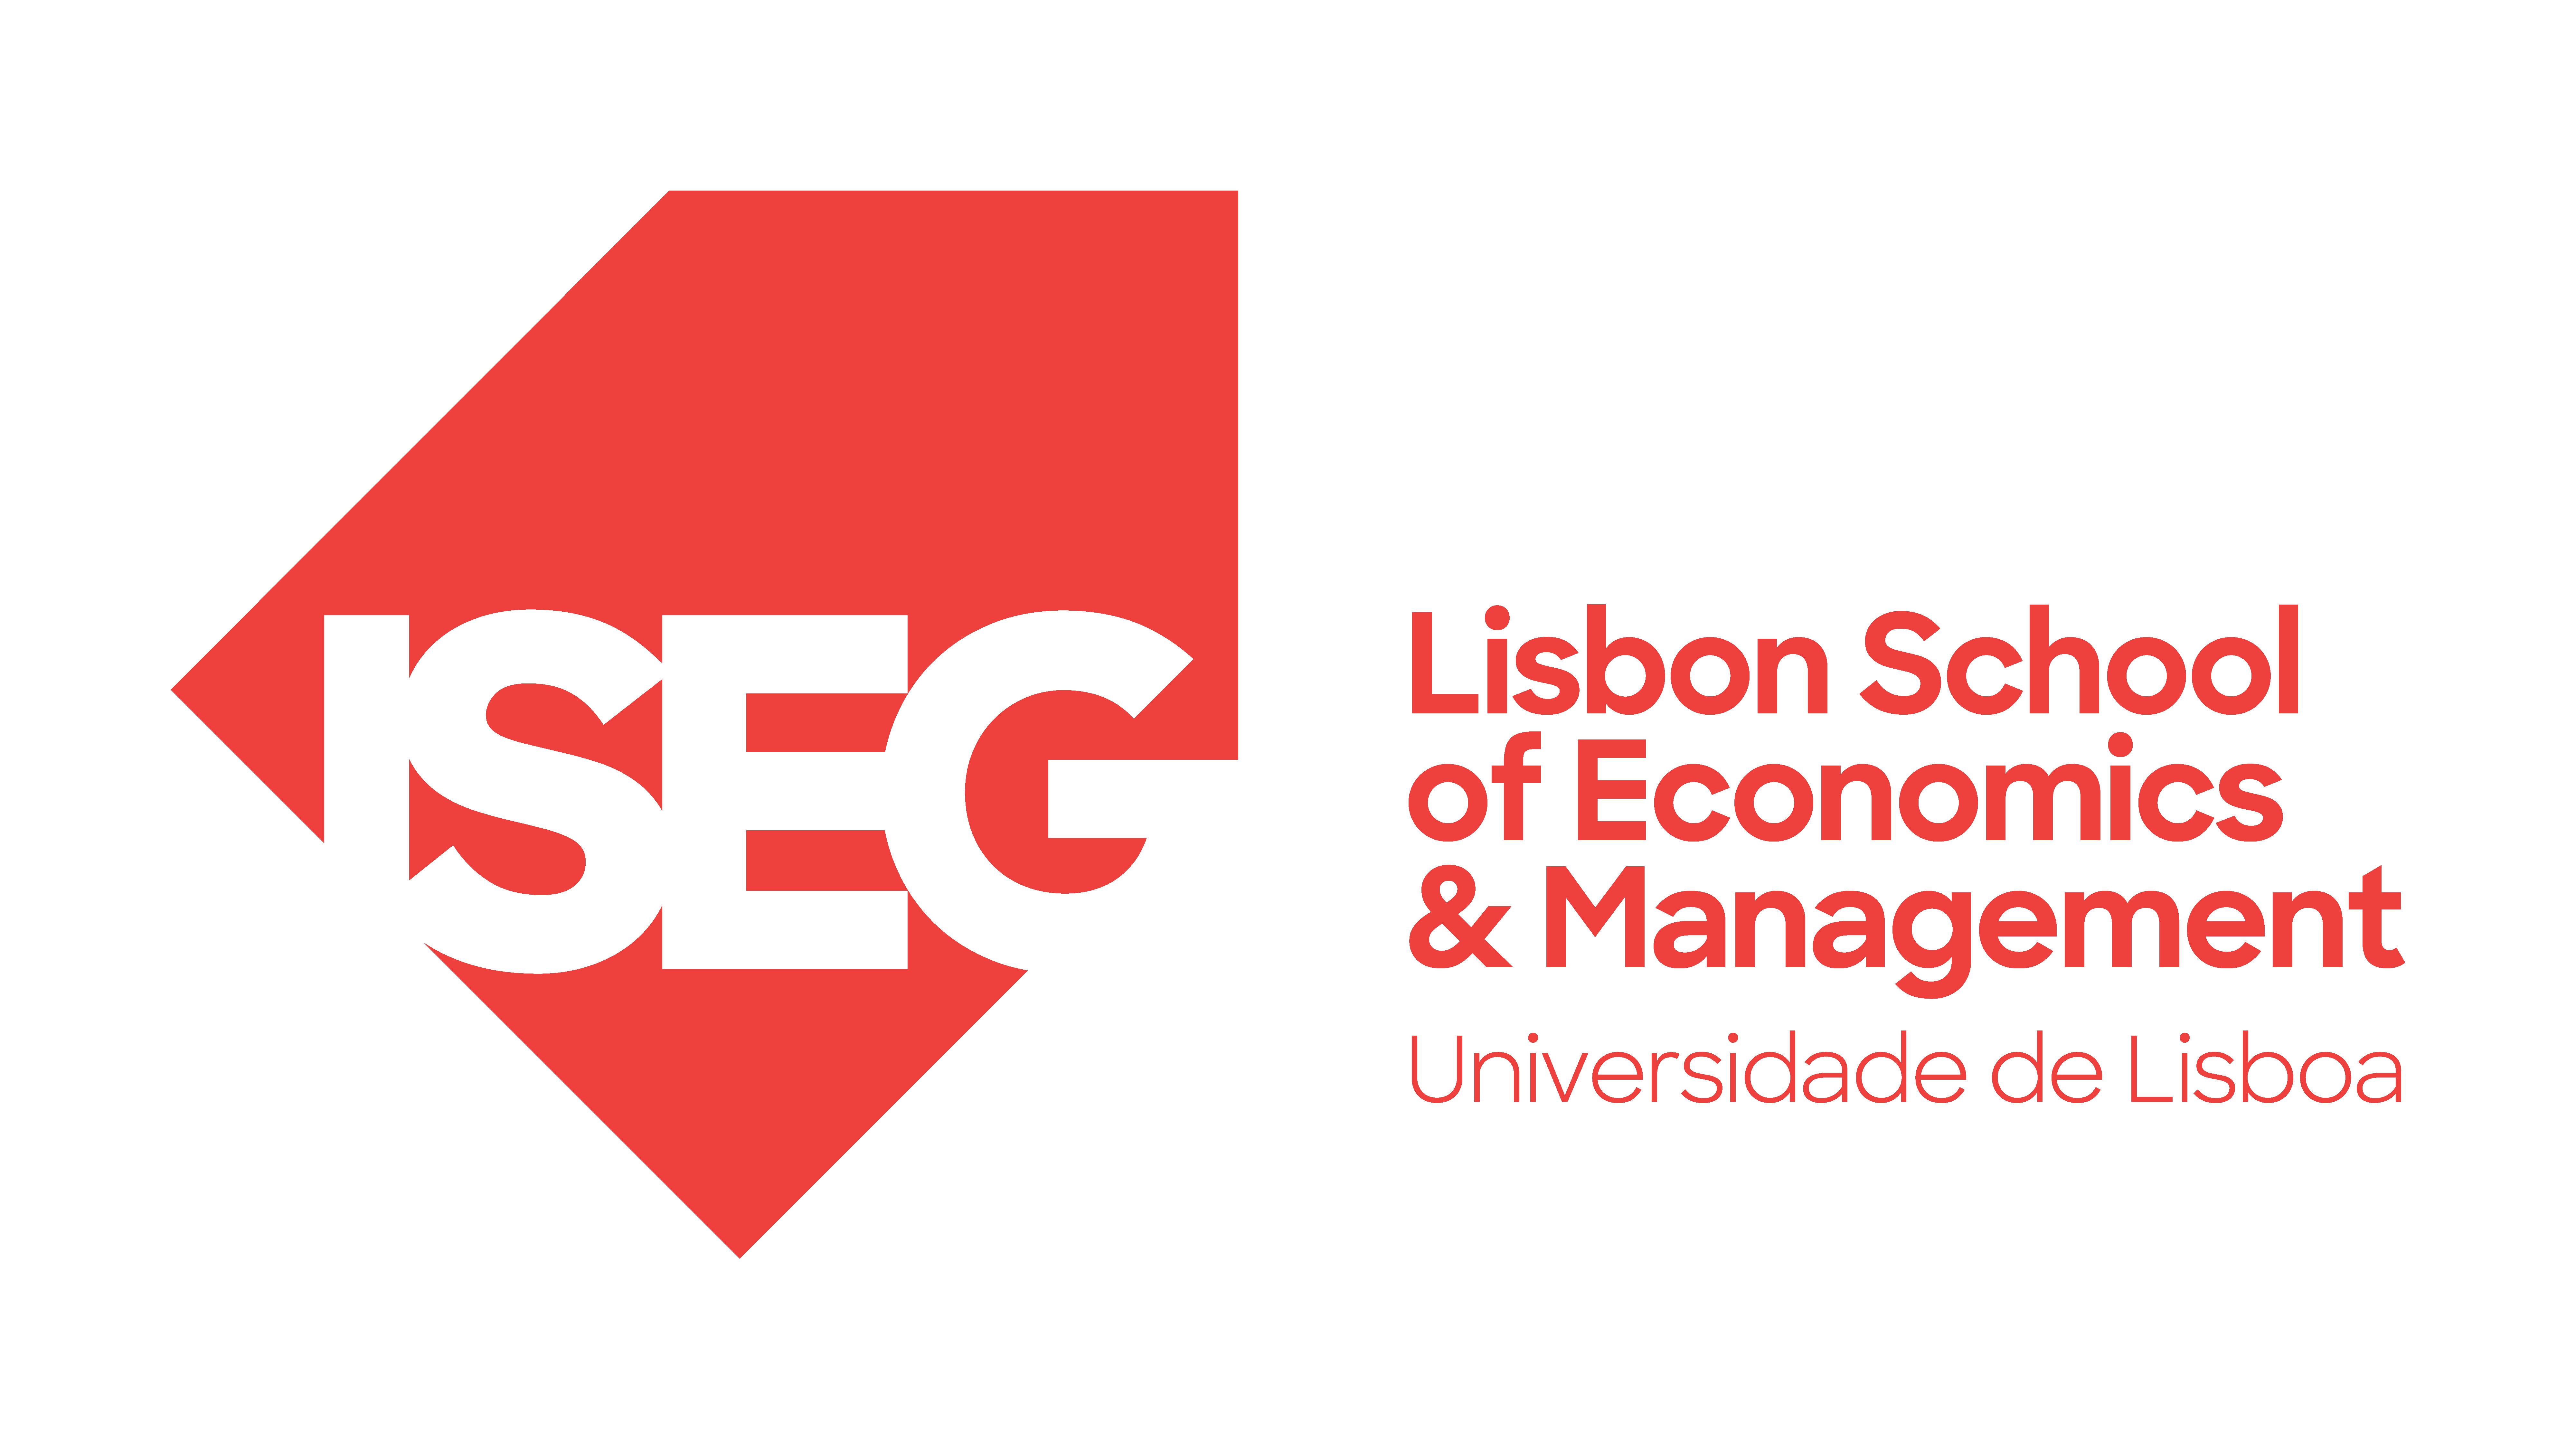 7th International Workshop on the Socio-Economics of Ageing